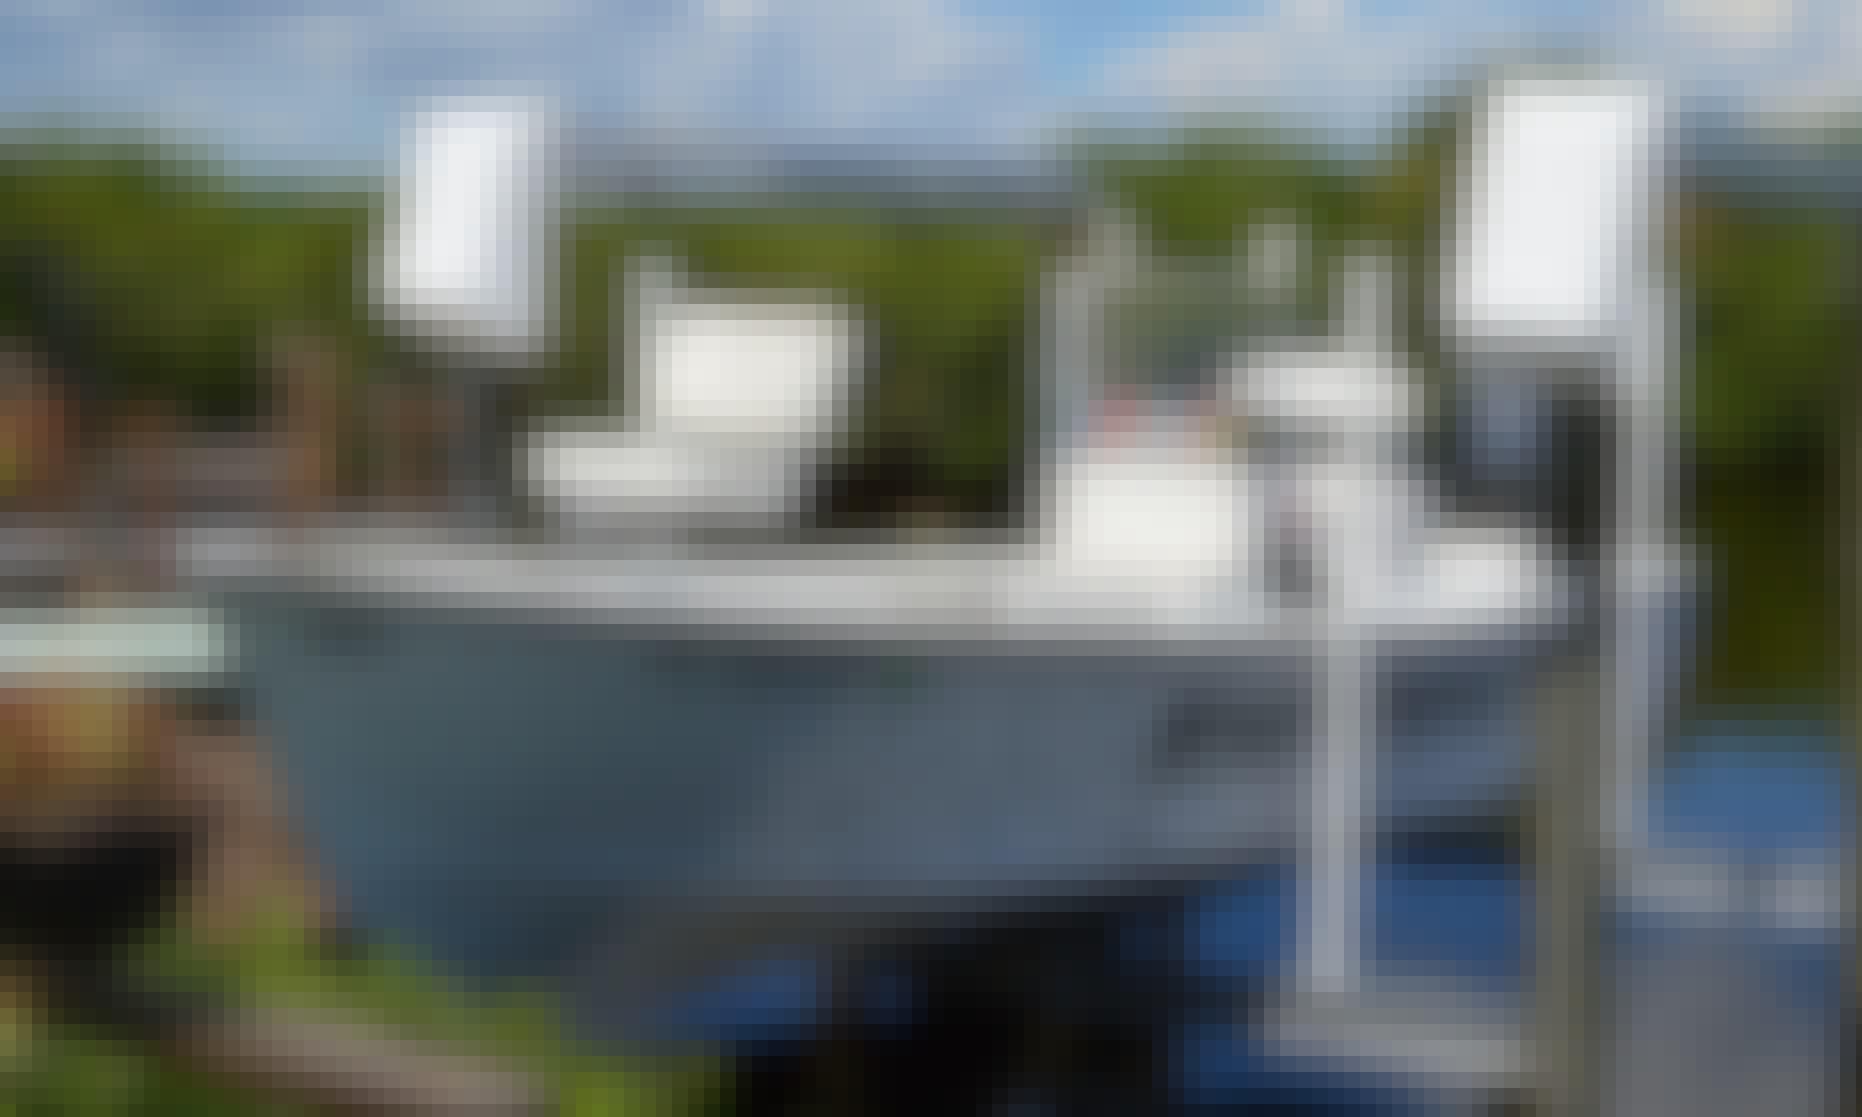 Enjoy Fishing in Placida, Florida 24' Center Console